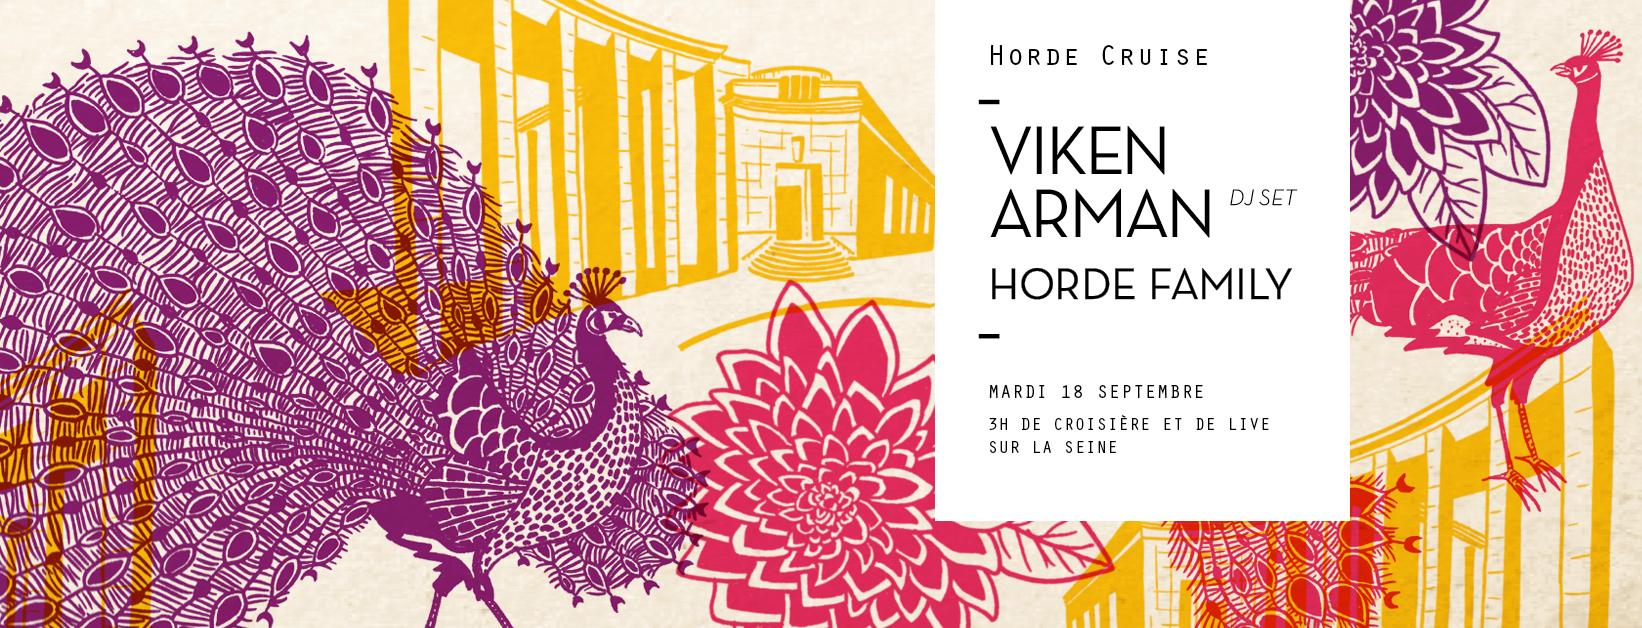 Horde Cruise S2EP09 : Viken Arman